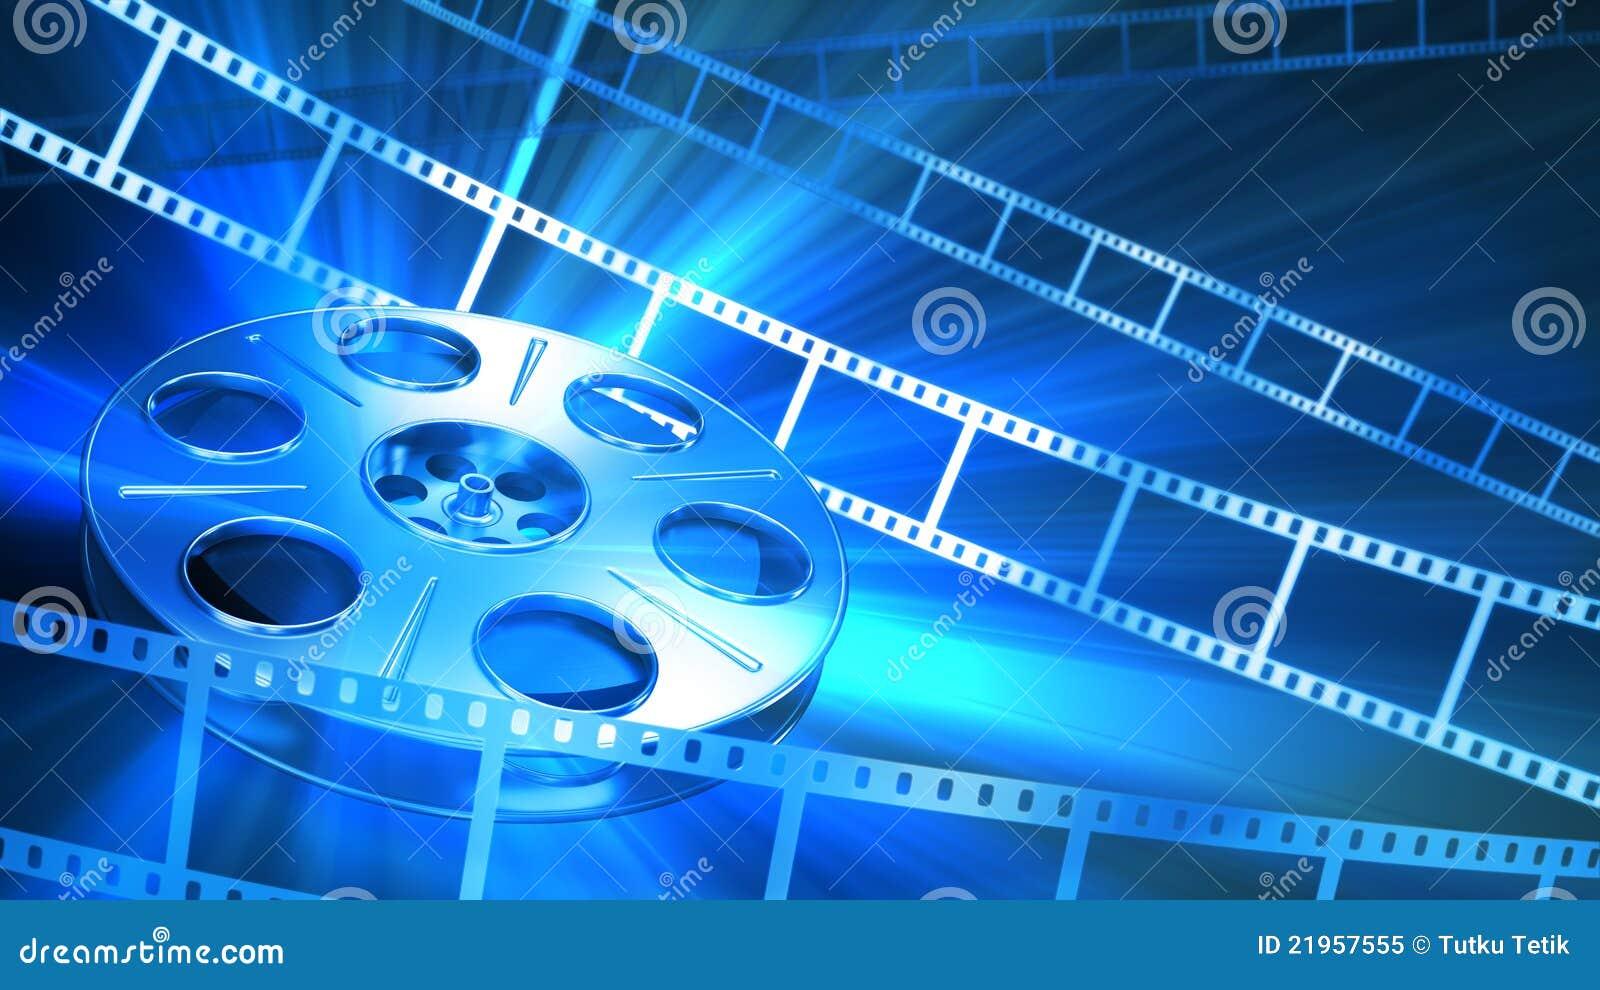 cinema background stock illustration illustration of